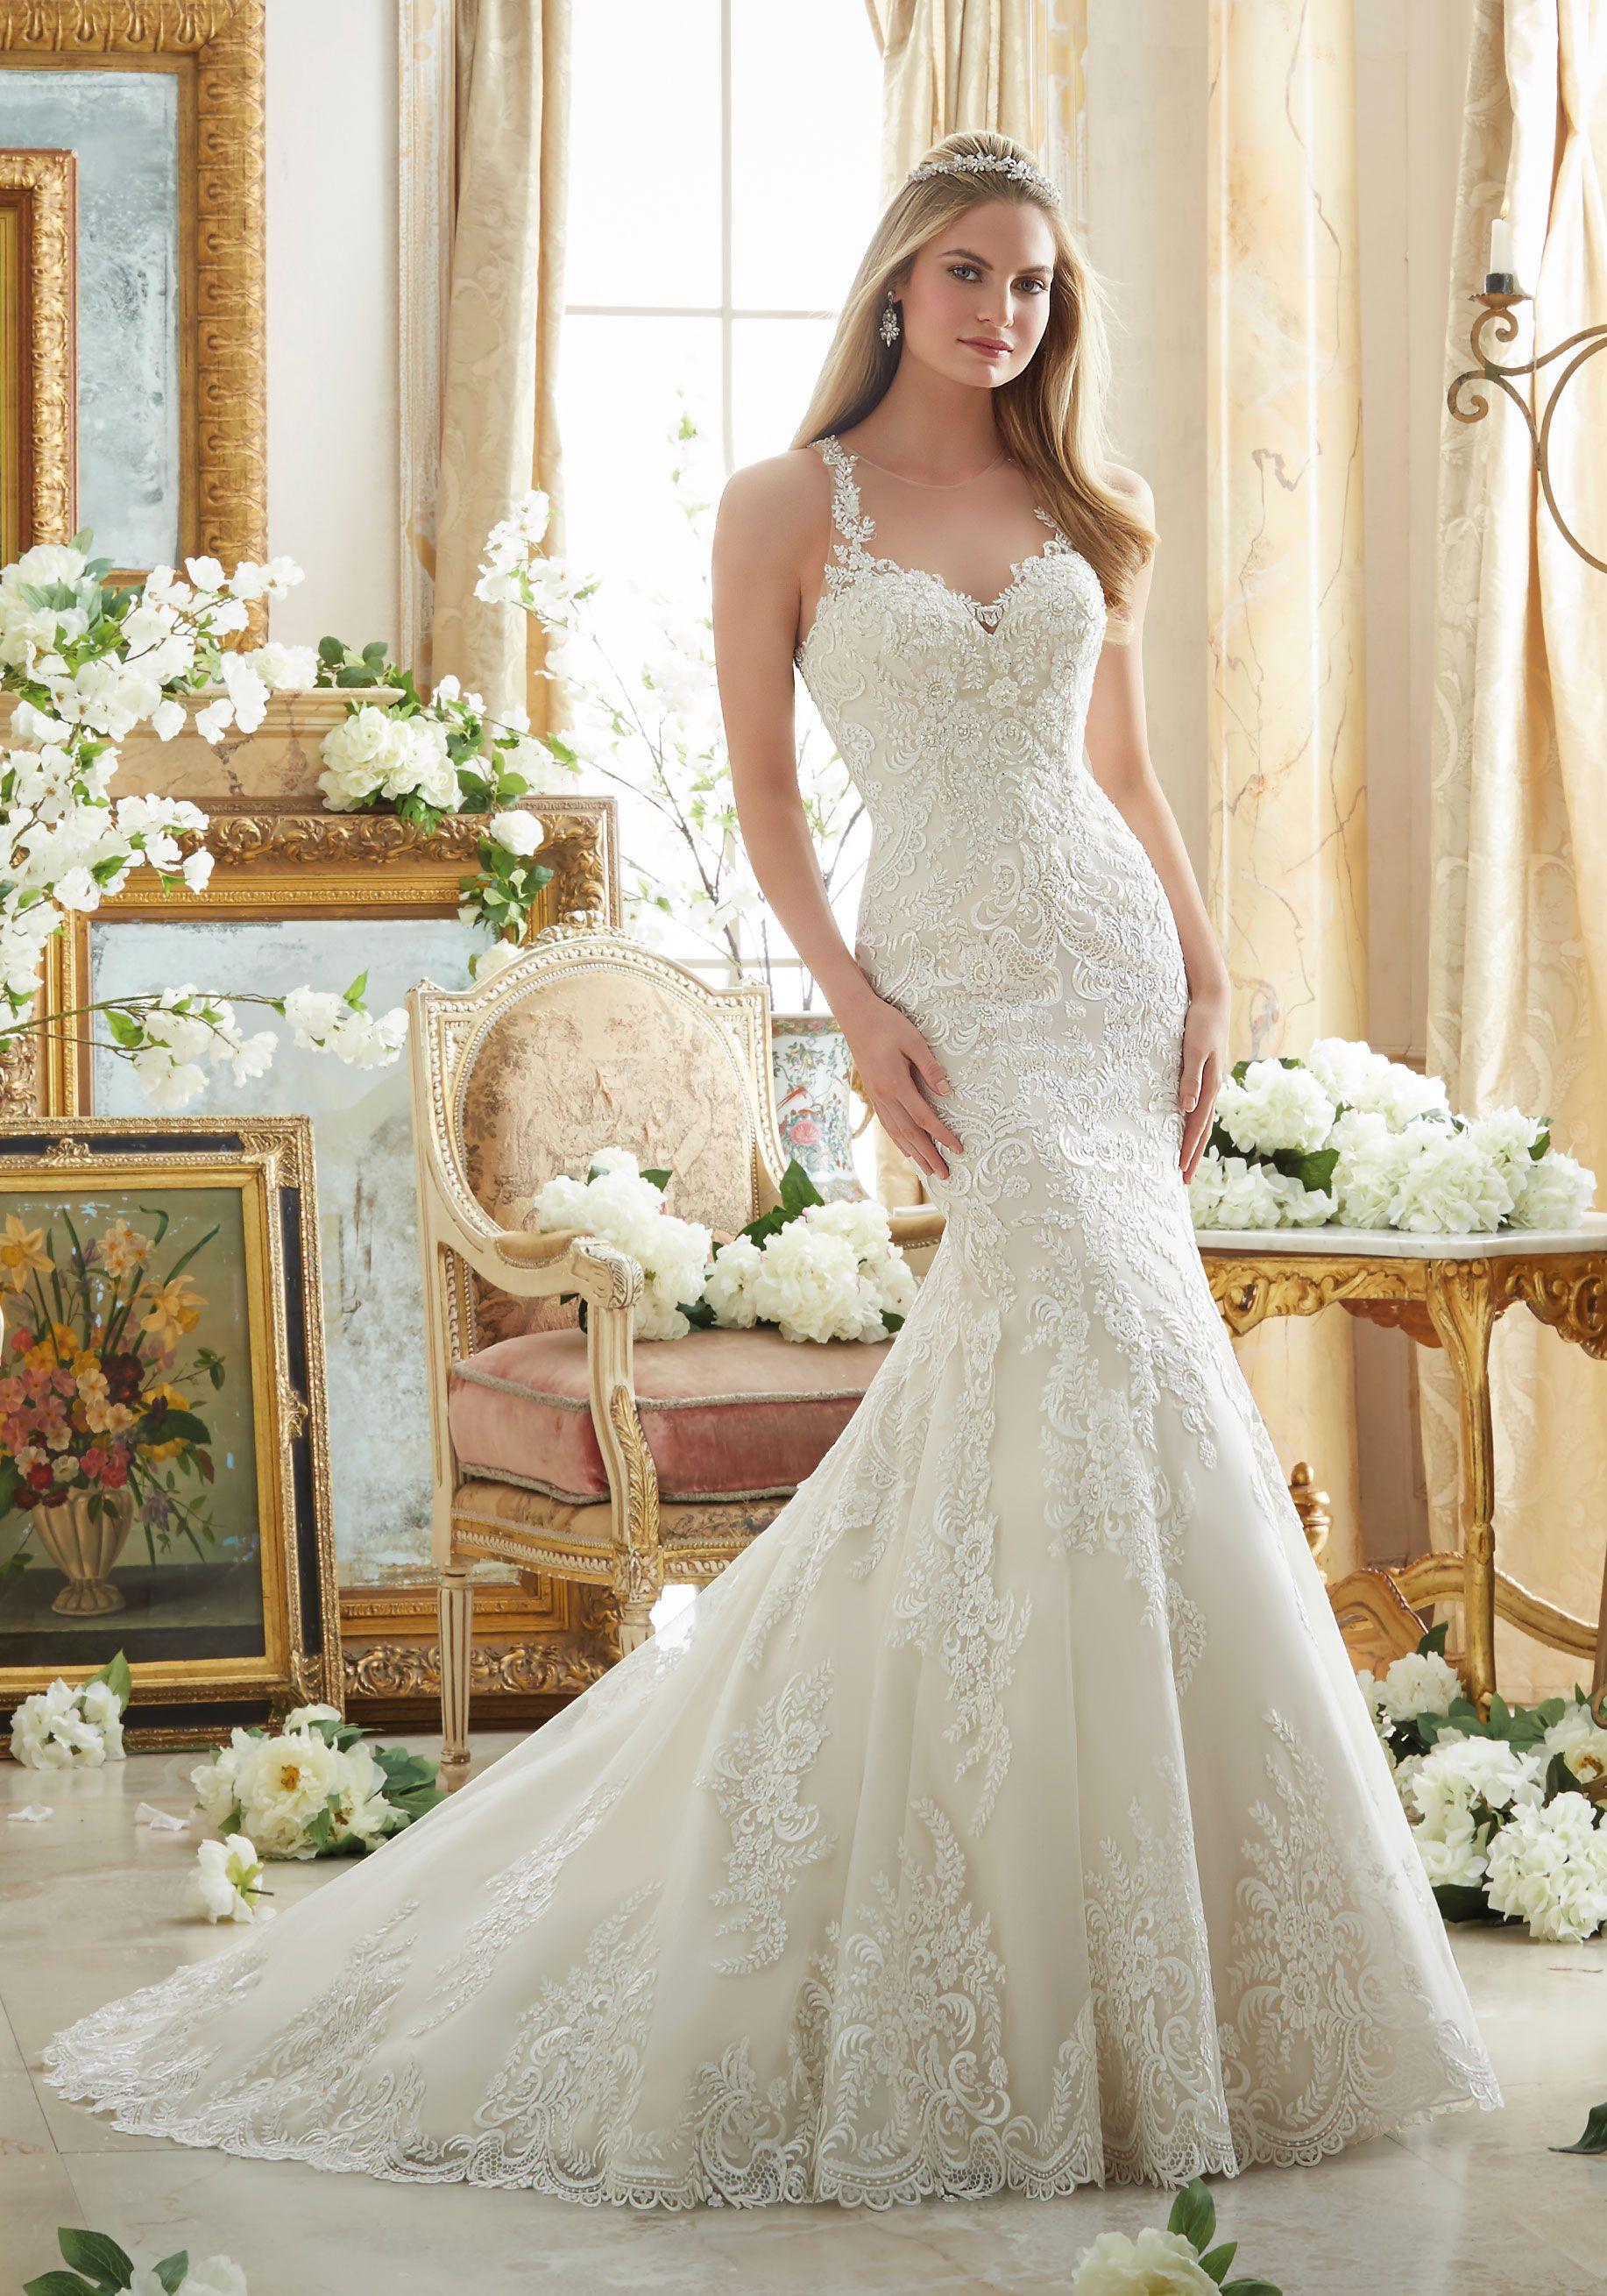 Embroidered Lace On Soft Net With Wide Hemline Wedding Dress Designed By Madeline Gardner Color Mori Lee Wedding Dress Cheap Wedding Dress Wedding Dress Sizes